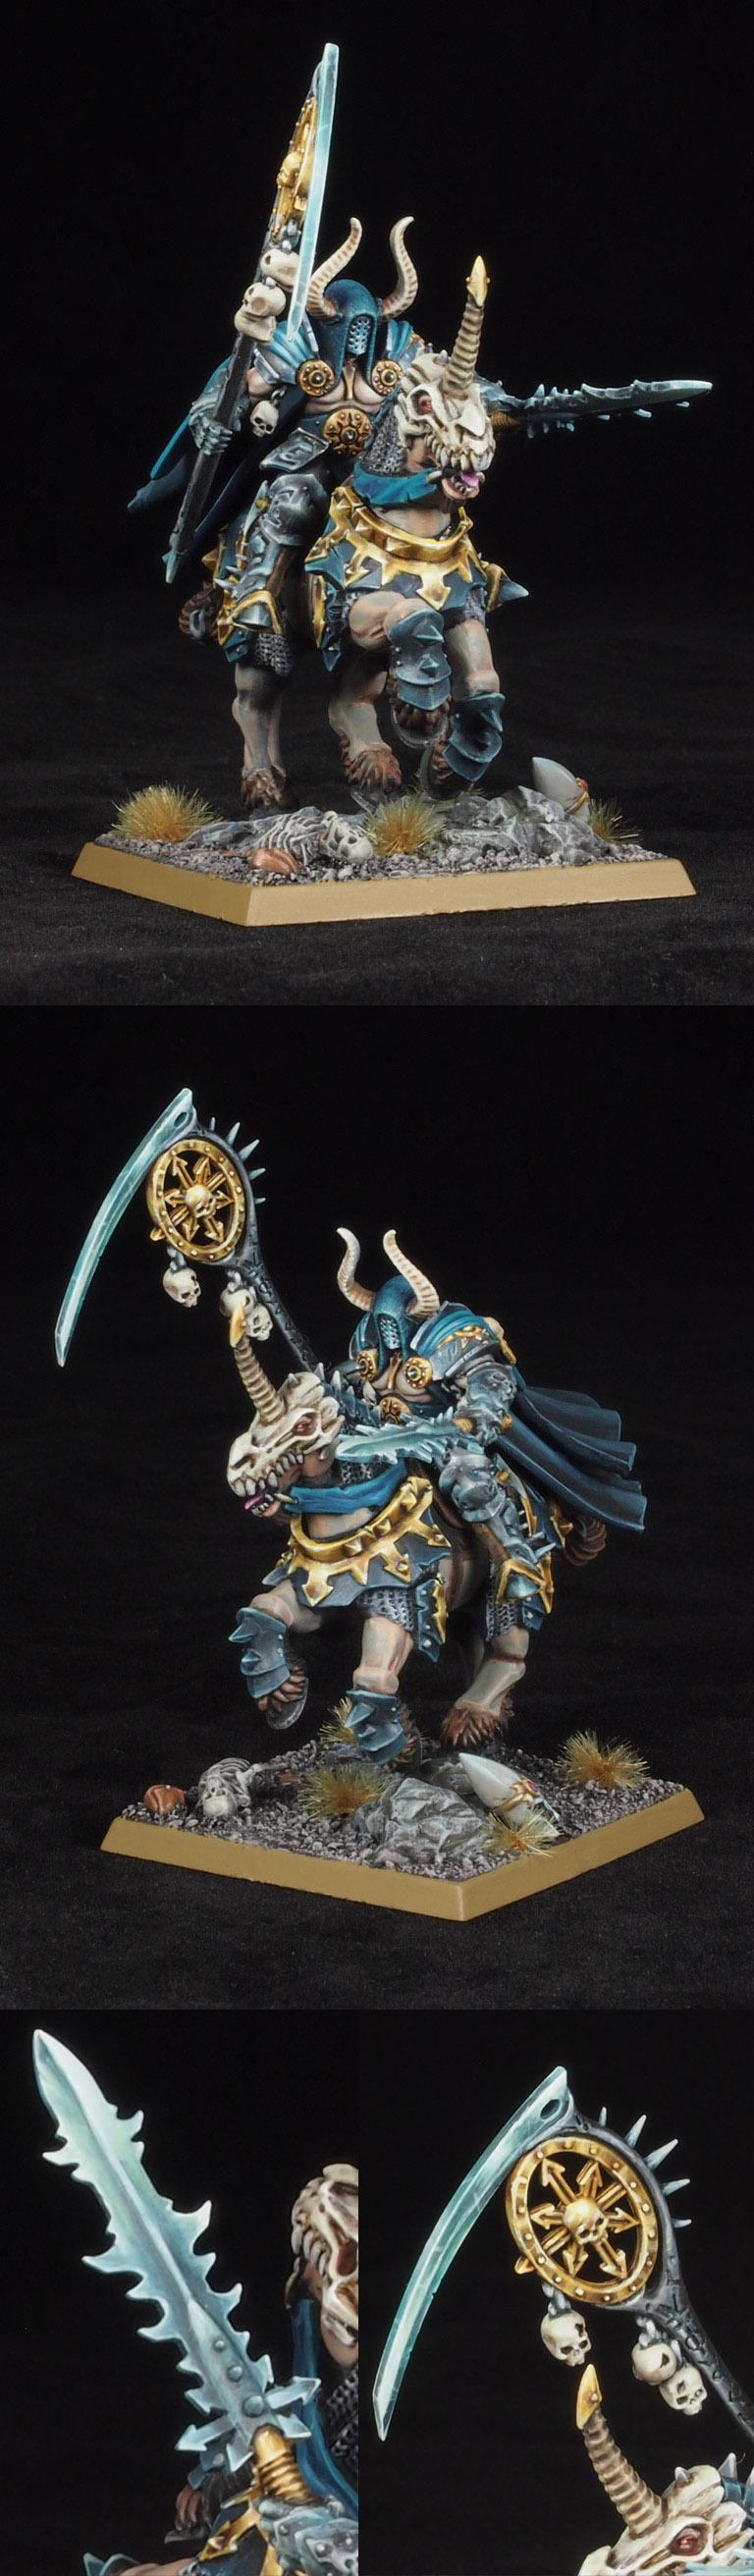 Warriors of Chaos Sorcerer Lord of Tzeentch on Daemonic Mount.